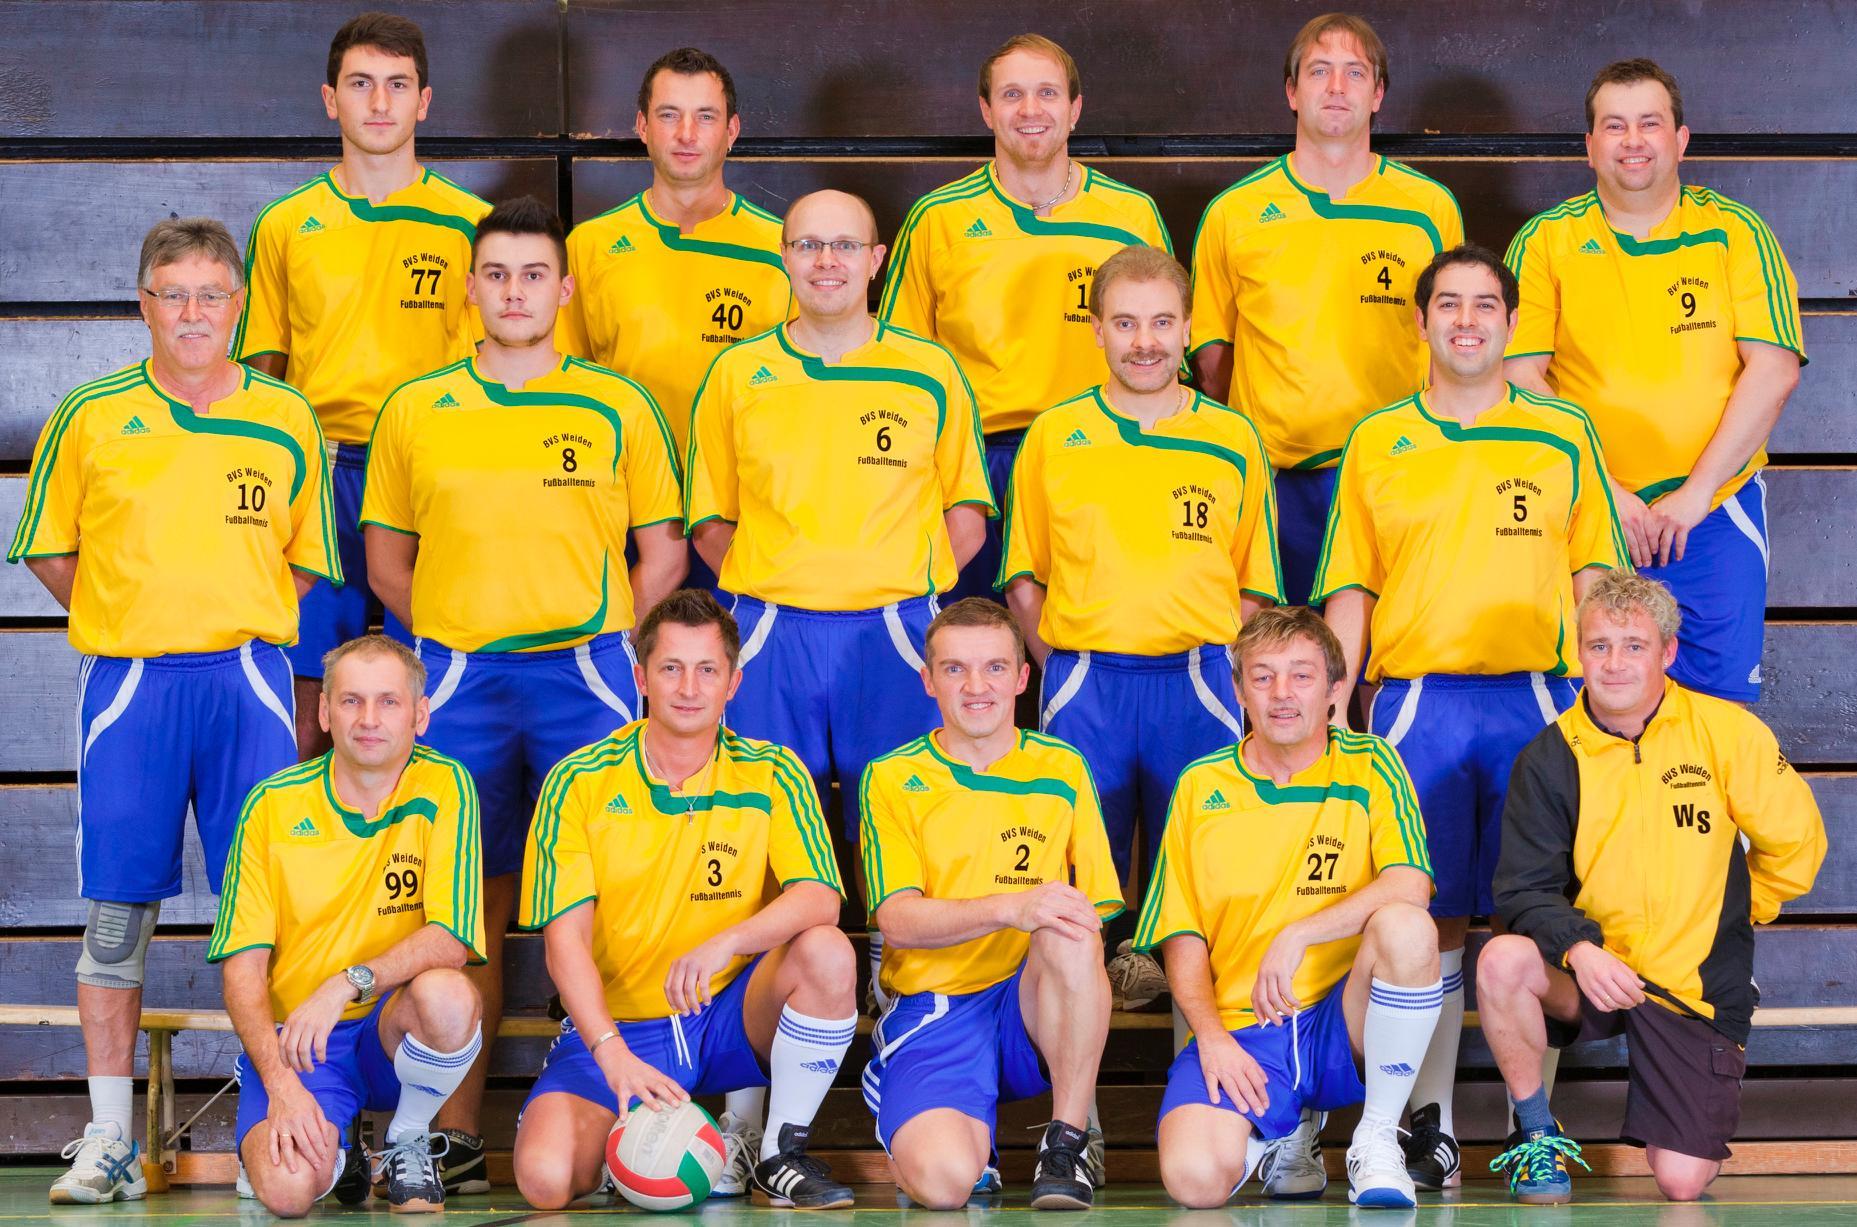 Mannschaftsfoto BVS Weiden